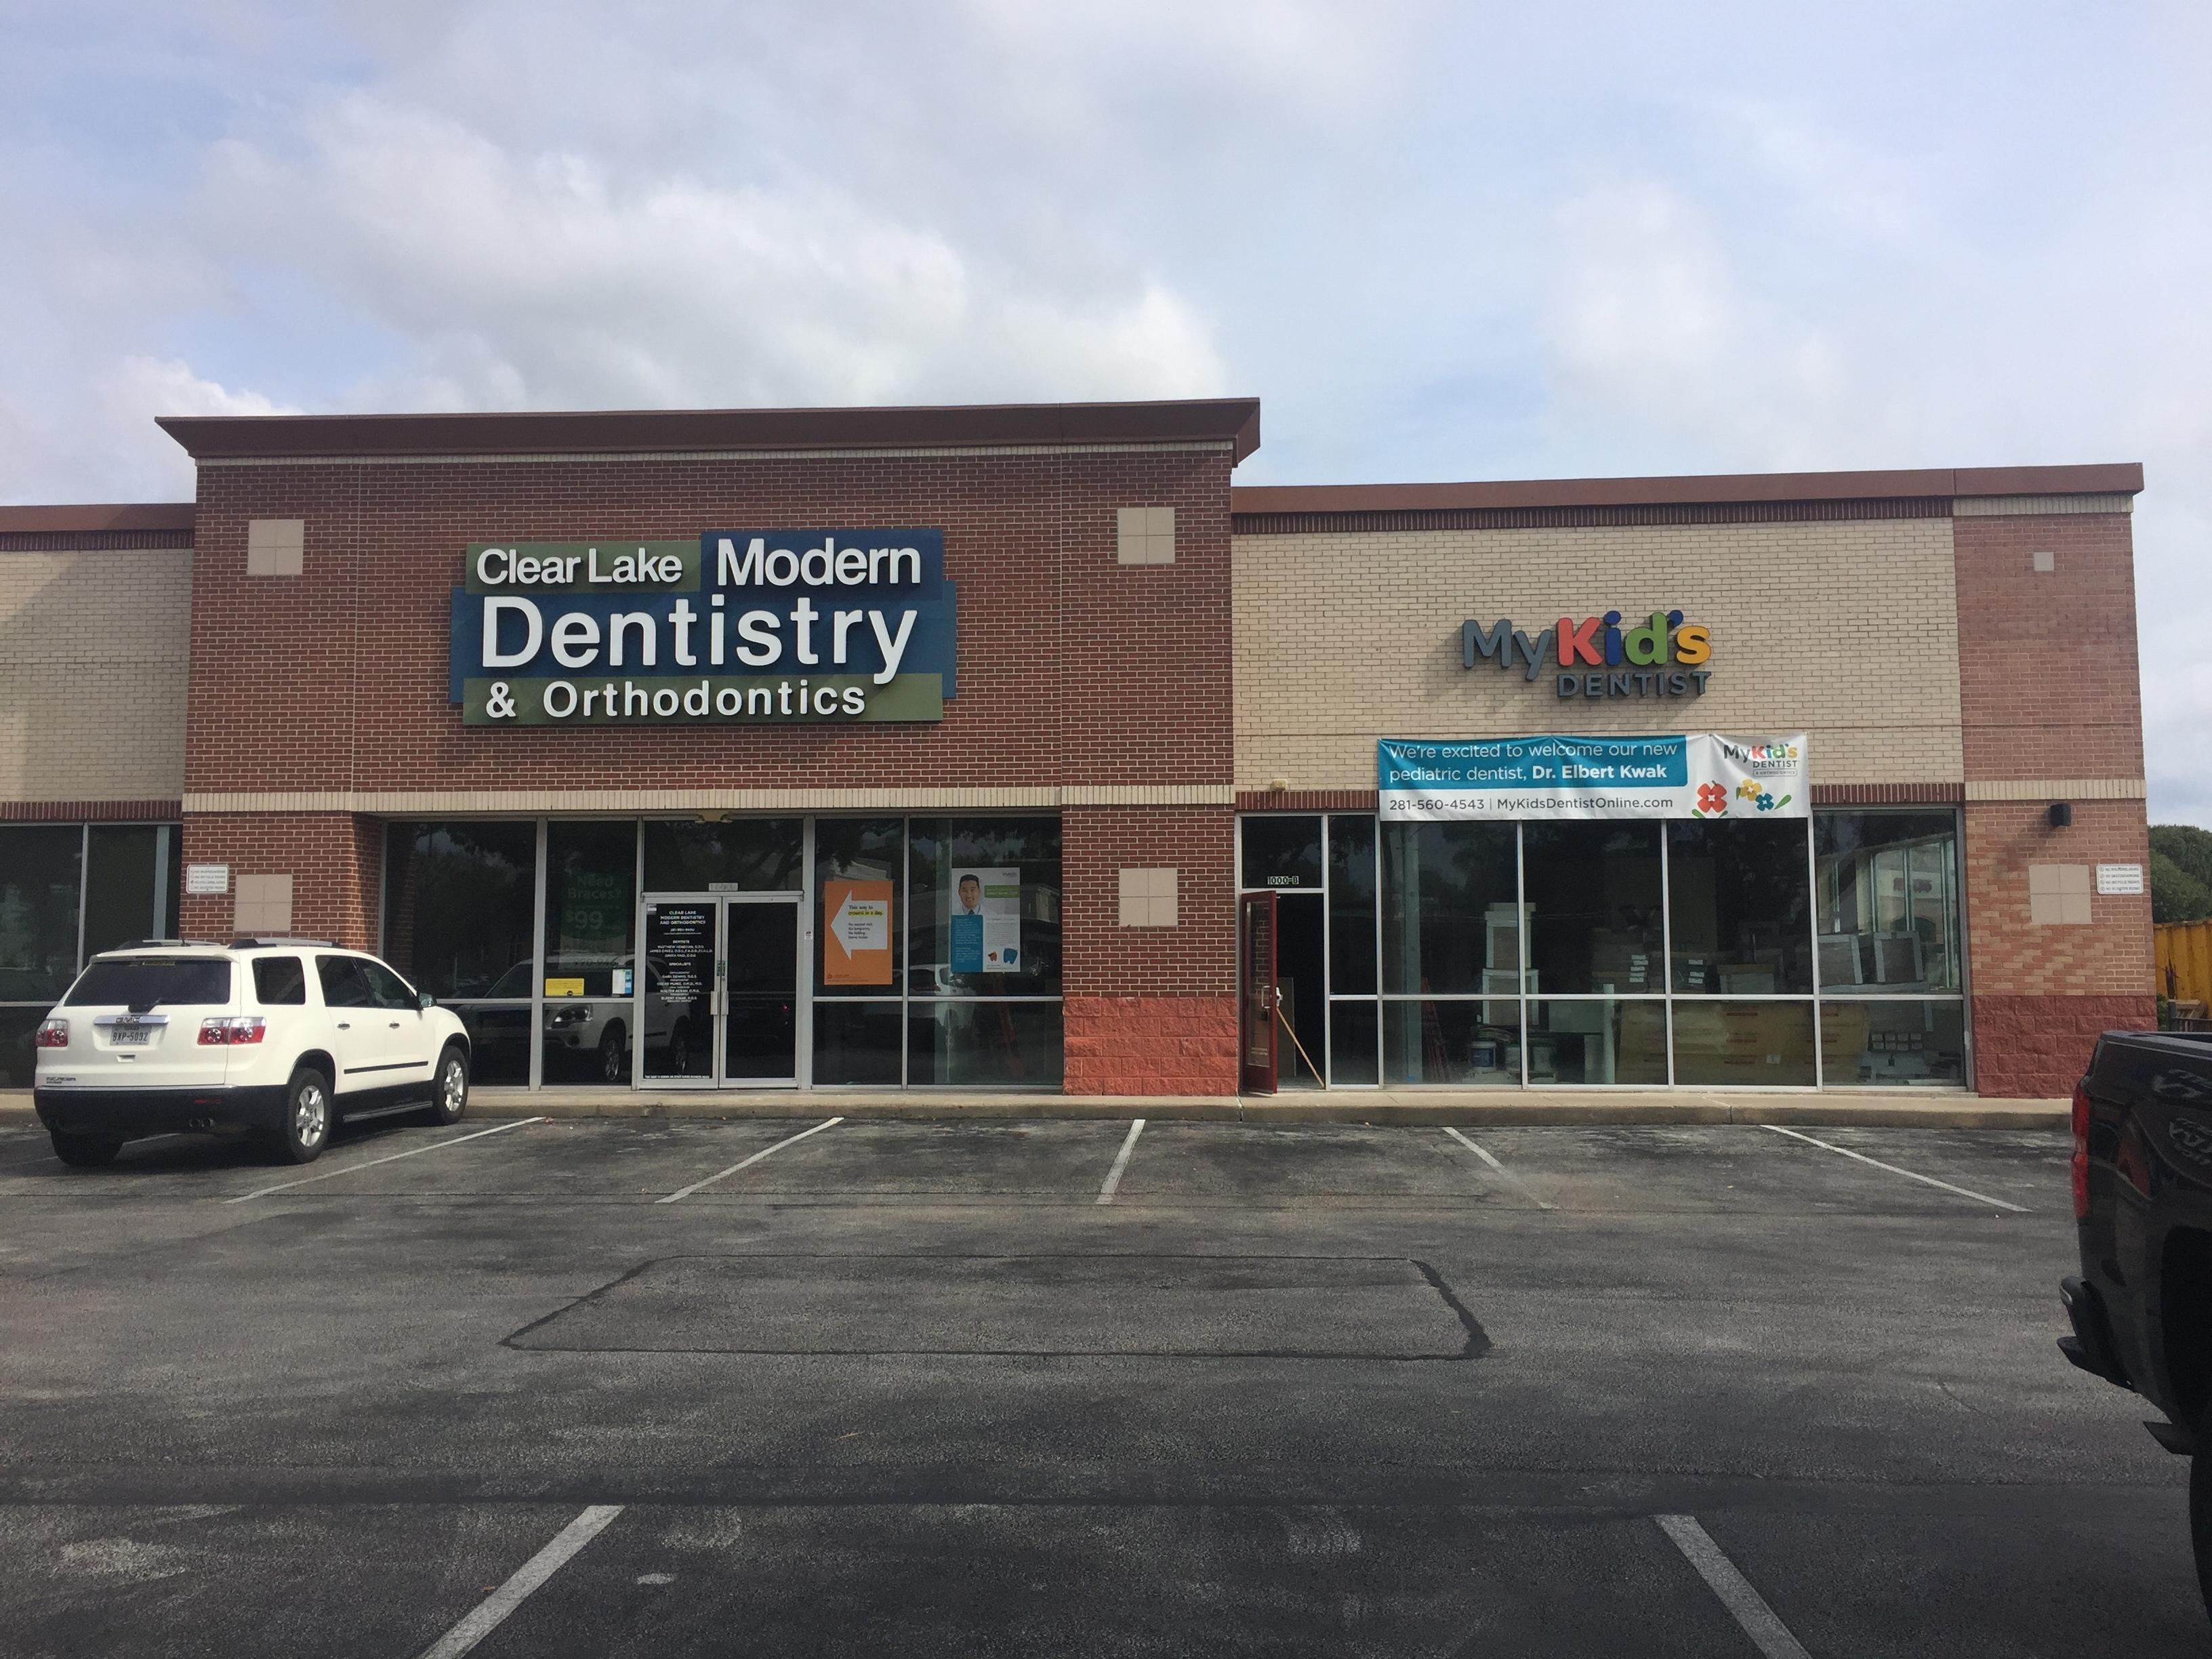 My Kid's Dentist image 1